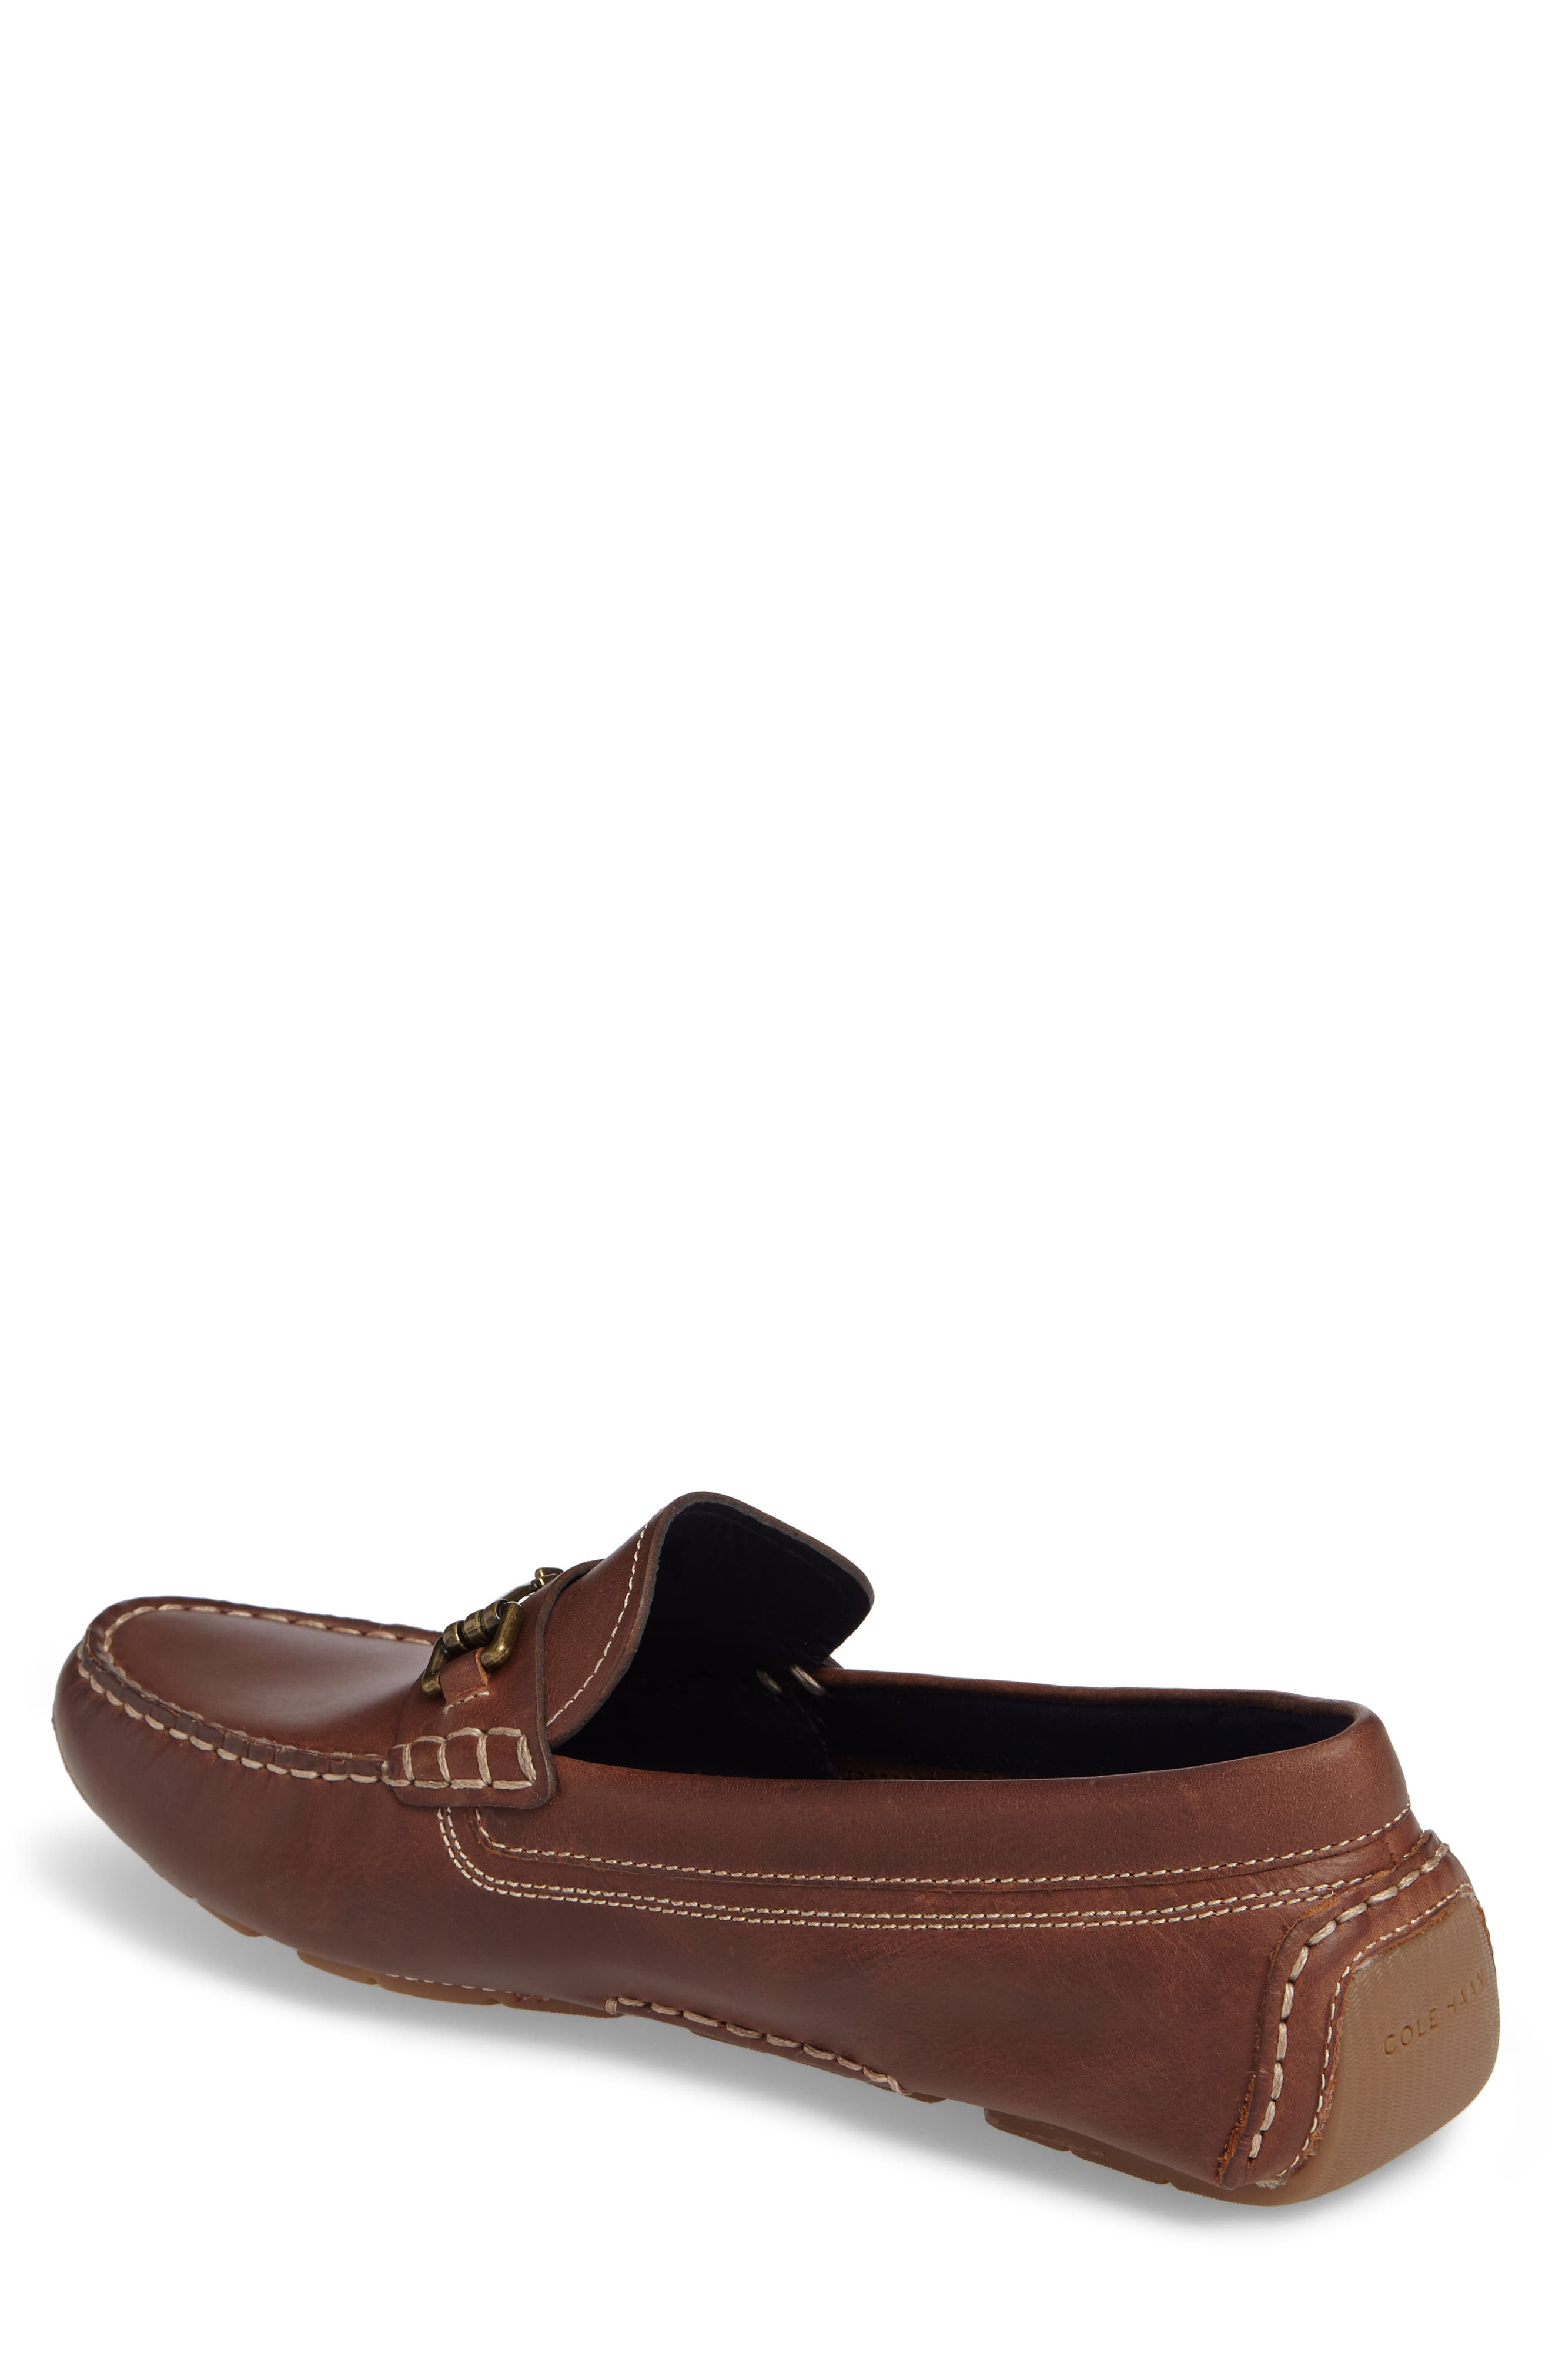 Alternate Image 2  - Cole Haan Kelson Bit Driving Shoe (Men)